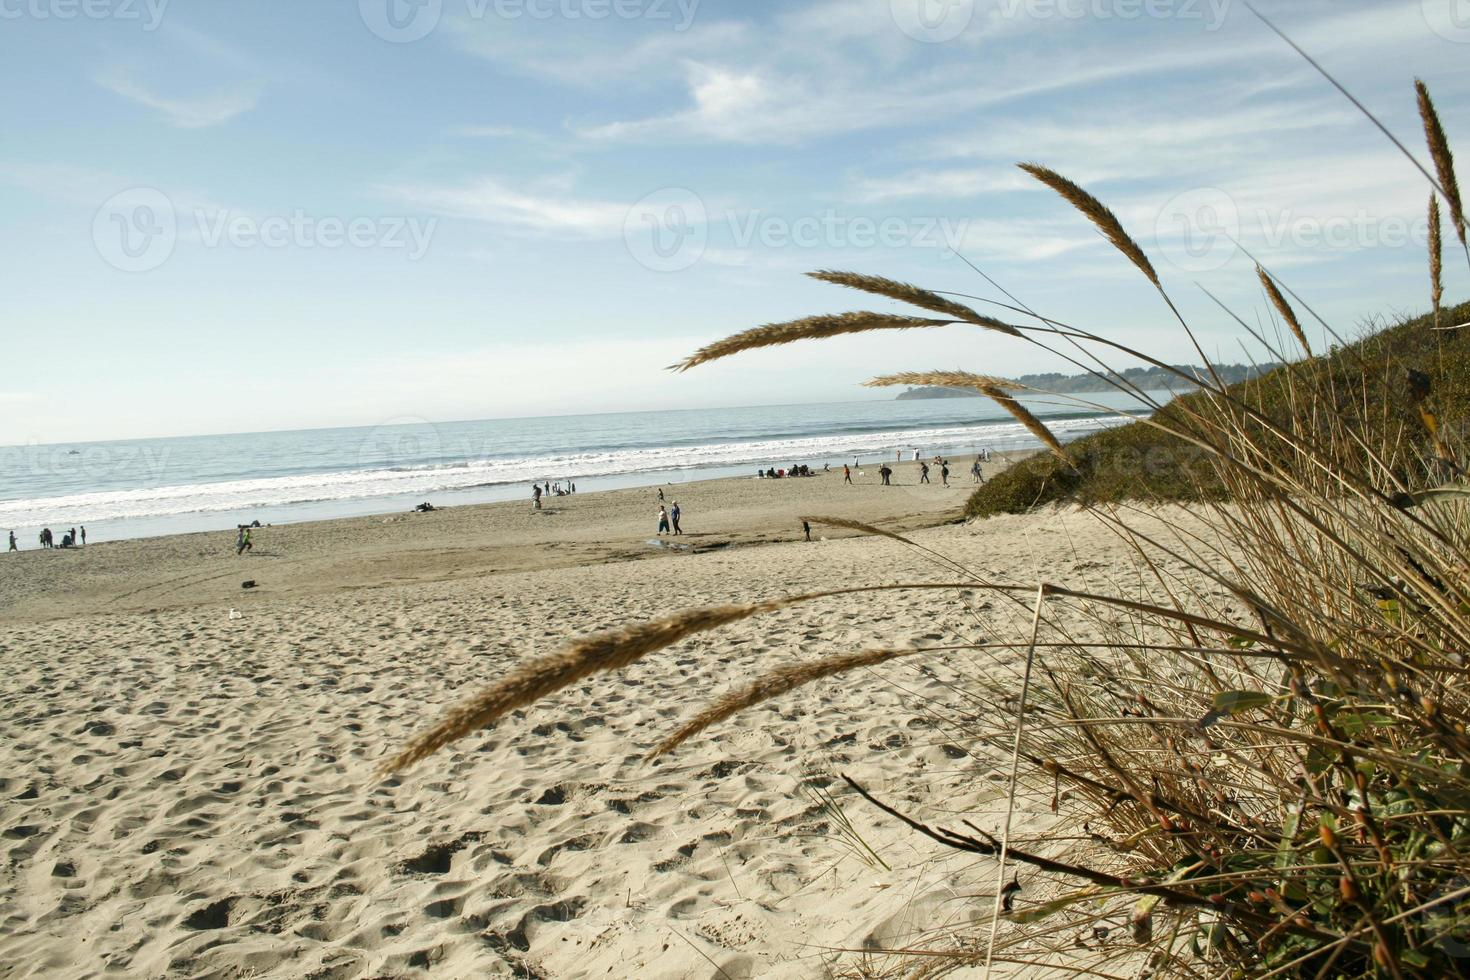 Stinson Beach - Tourism Shot photo